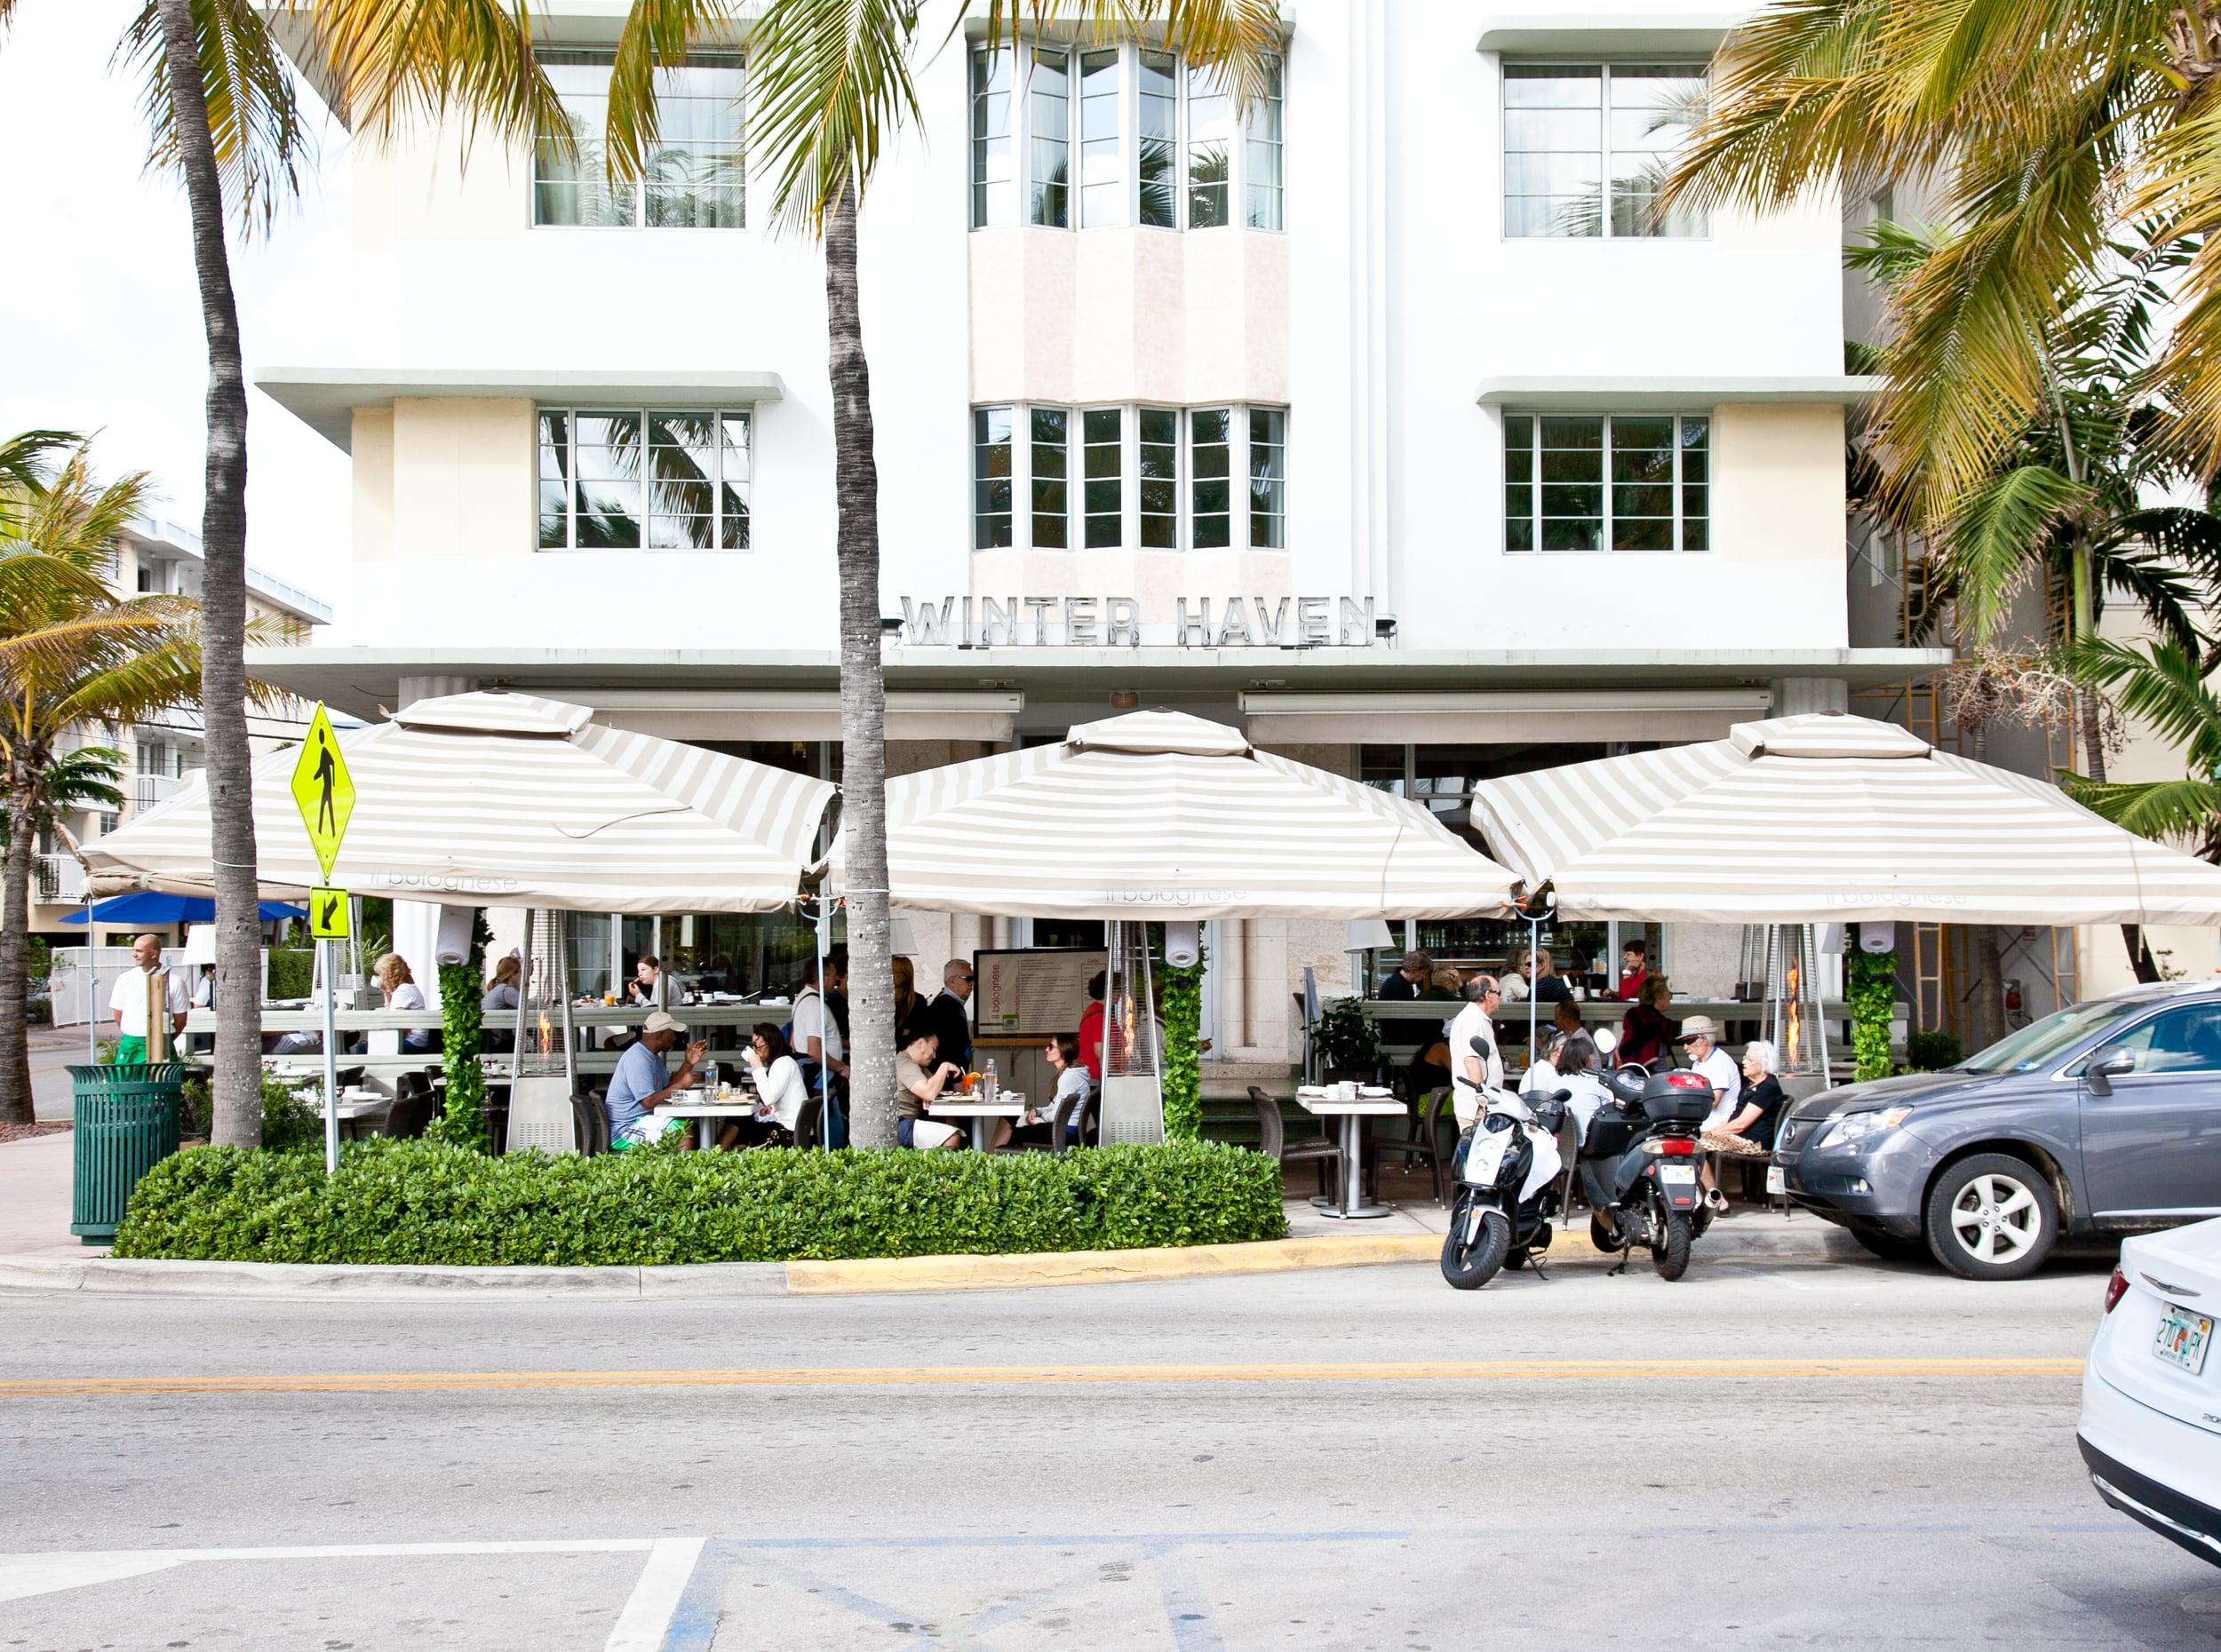 trisa-taro-ocean-drive-restaurants-miami.jpg